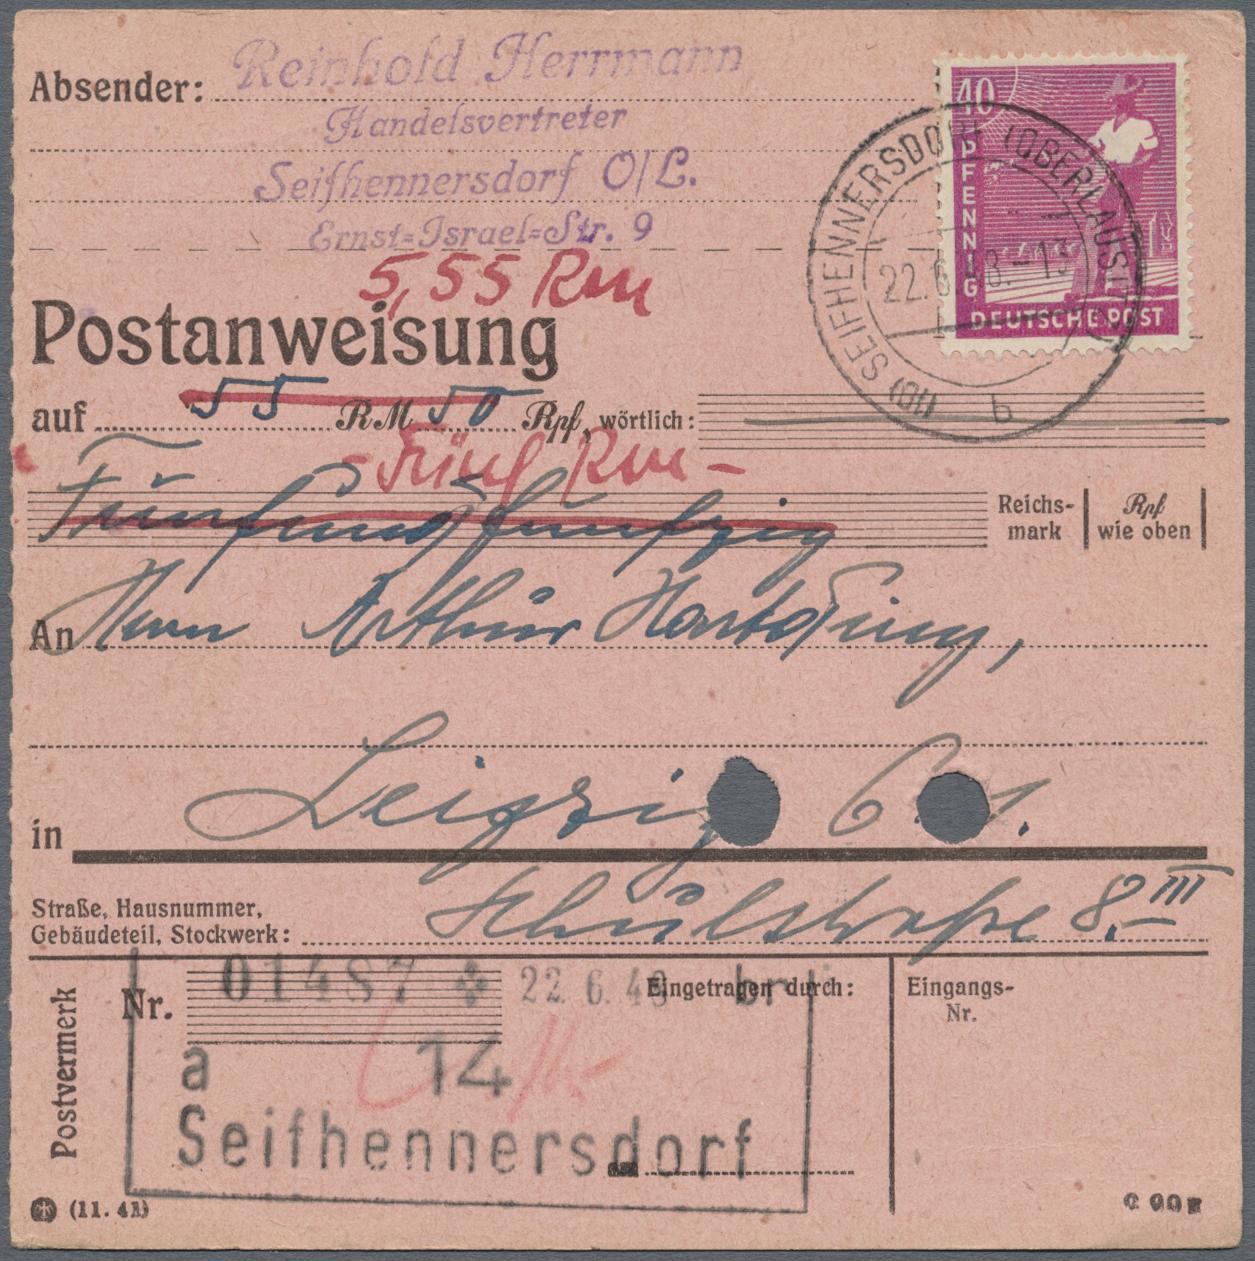 Lot 37904 - Alliierte Besetzung - Gemeinschaftsausgaben  -  Auktionshaus Christoph Gärtner GmbH & Co. KG Collections Germany,  Collections Supplement, Surprise boxes #39 Day 7